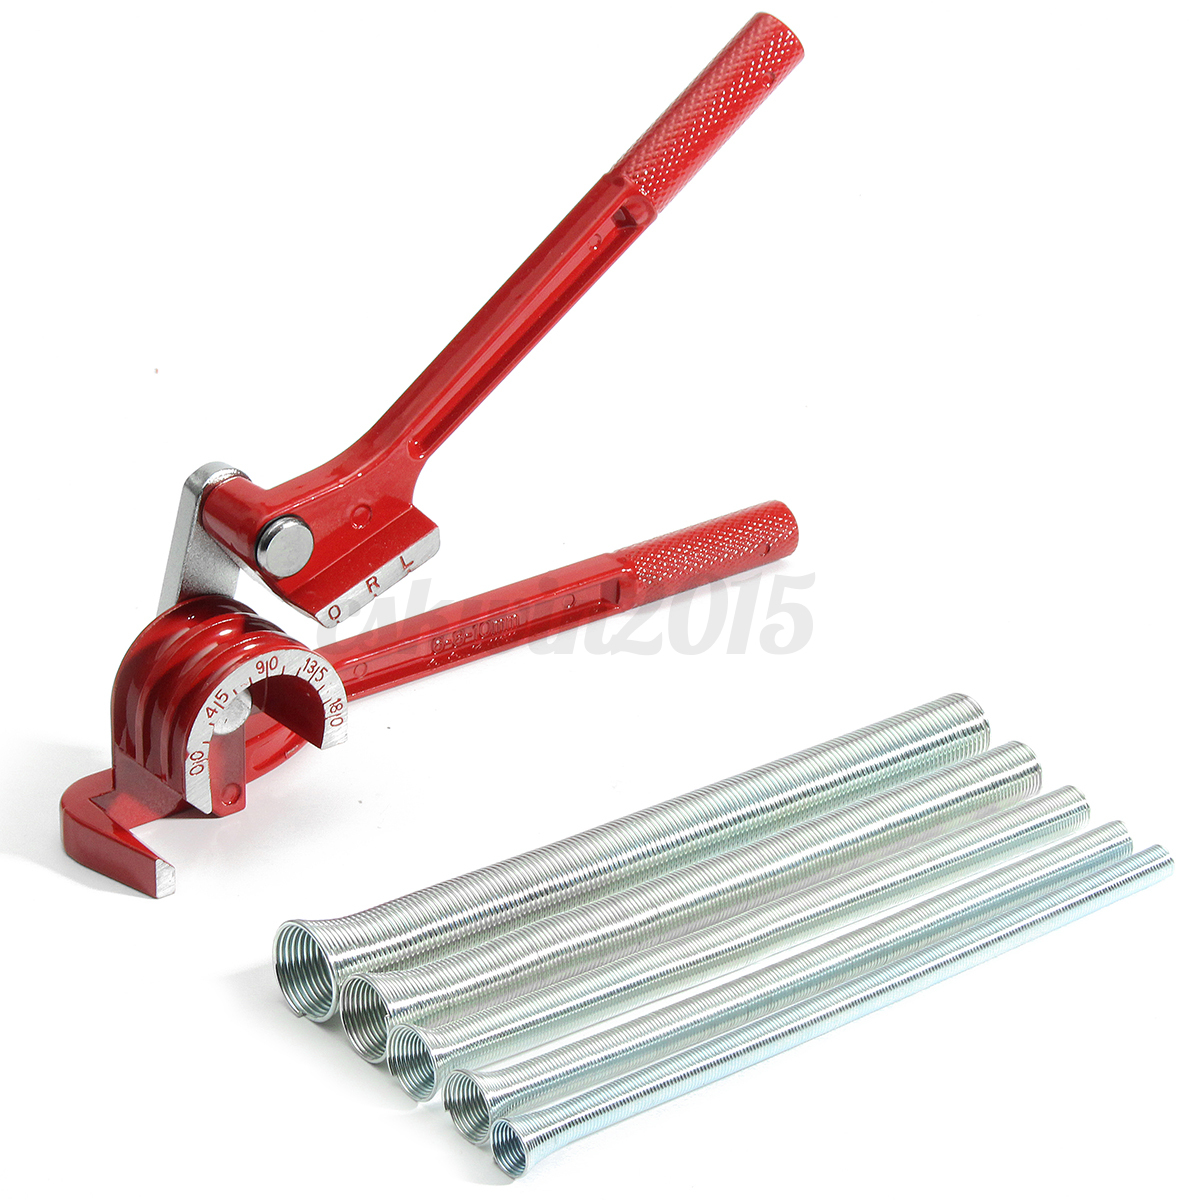 4 type tube bender pipe bending cutter tool for plumbing. Black Bedroom Furniture Sets. Home Design Ideas